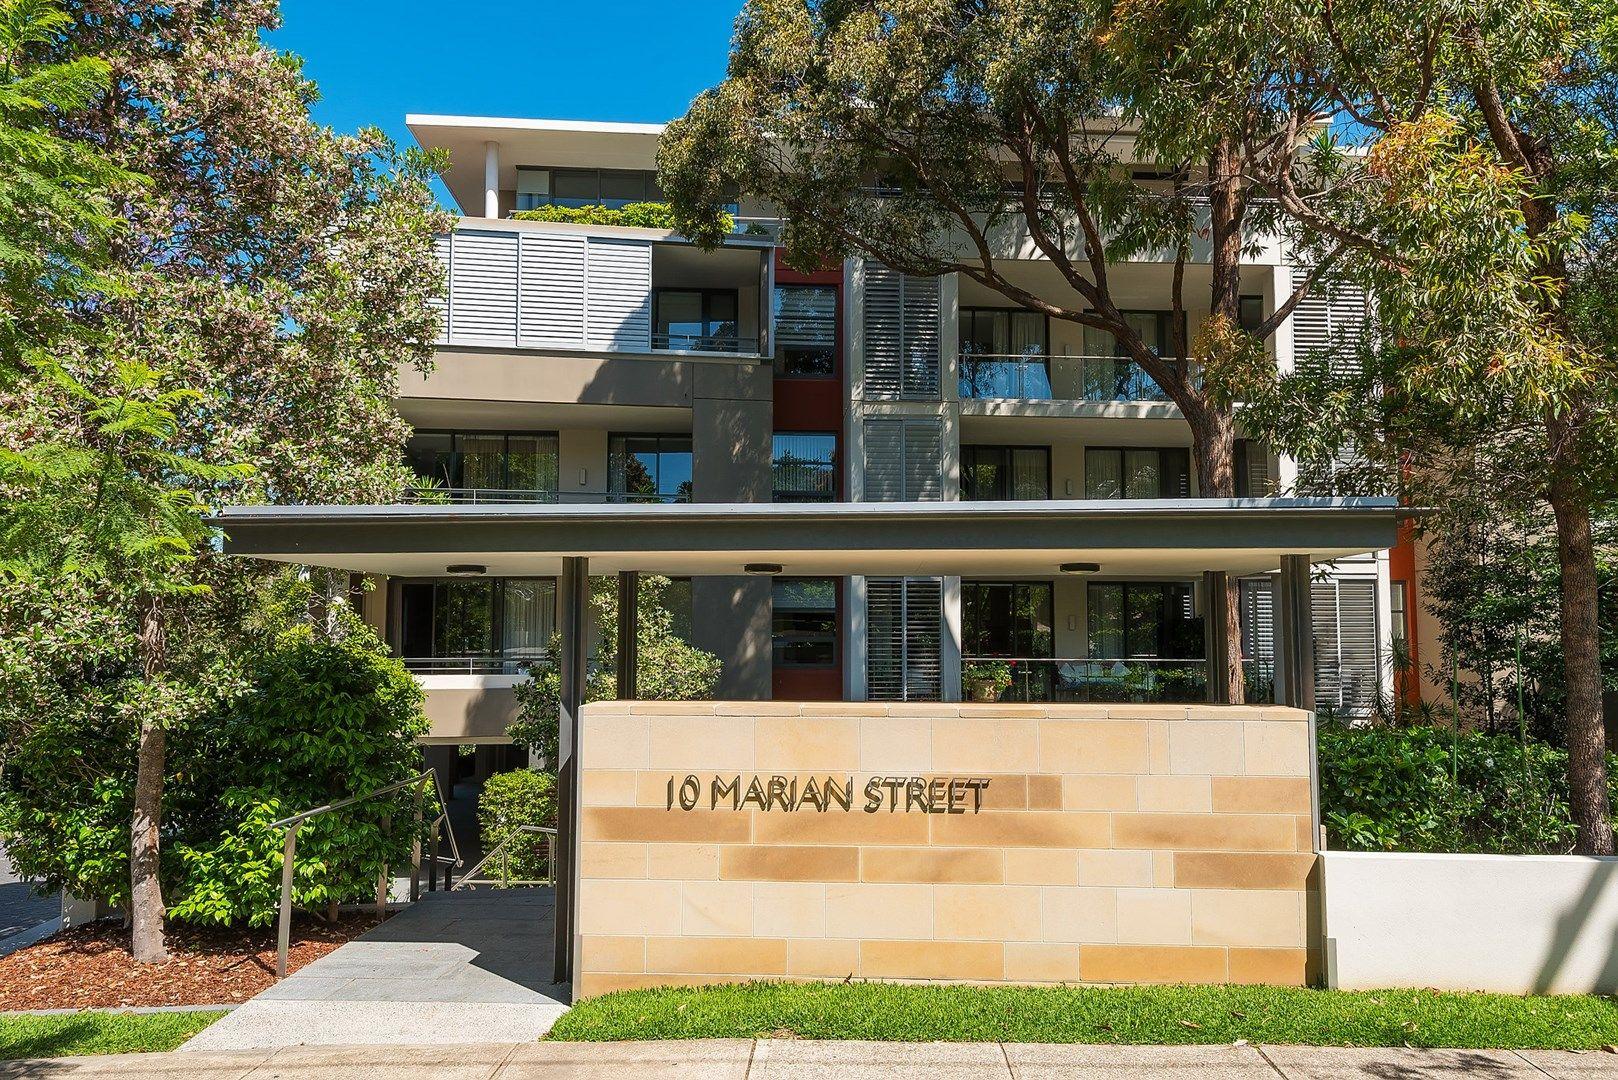 14/10 Marian Street, Killara NSW 2071, Image 0